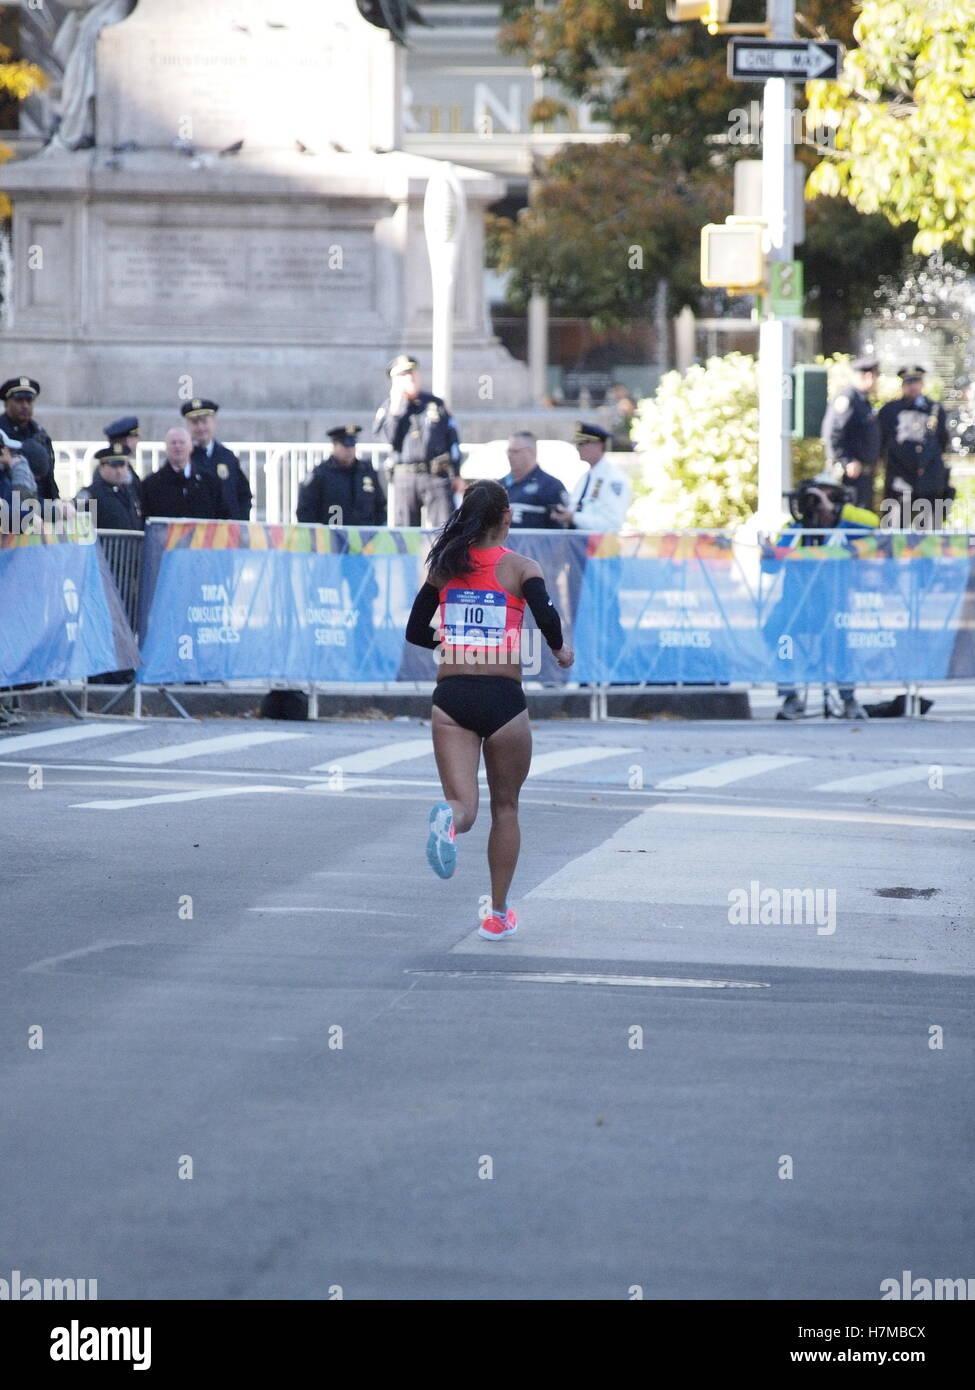 New York, New York, USA. 6. November 2016. NYC Marathon, Central Park, New York, NY USA Credit: Frank Rocco/Alamy Stockfoto